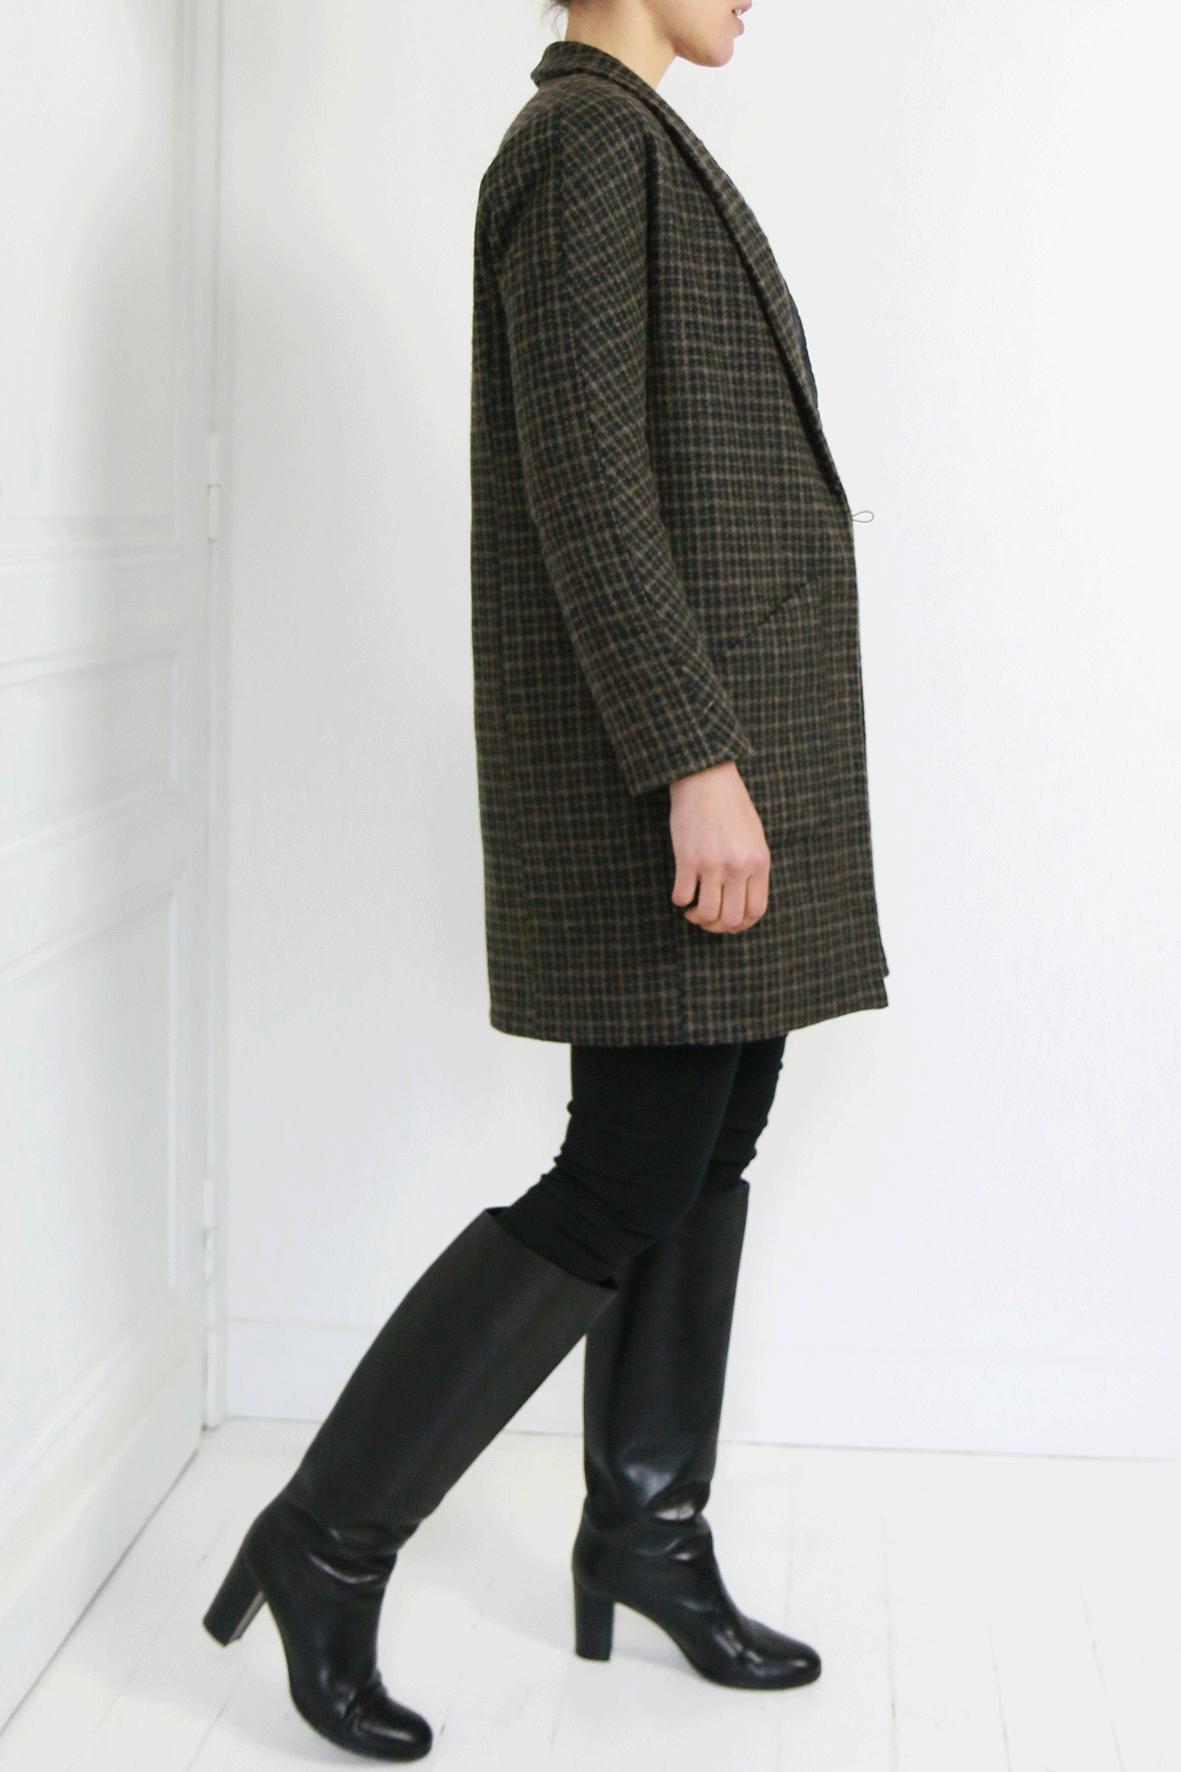 1-manteau-franceduvalstalla-anna-ka-bazaar-patron-couture-atelier-scammit